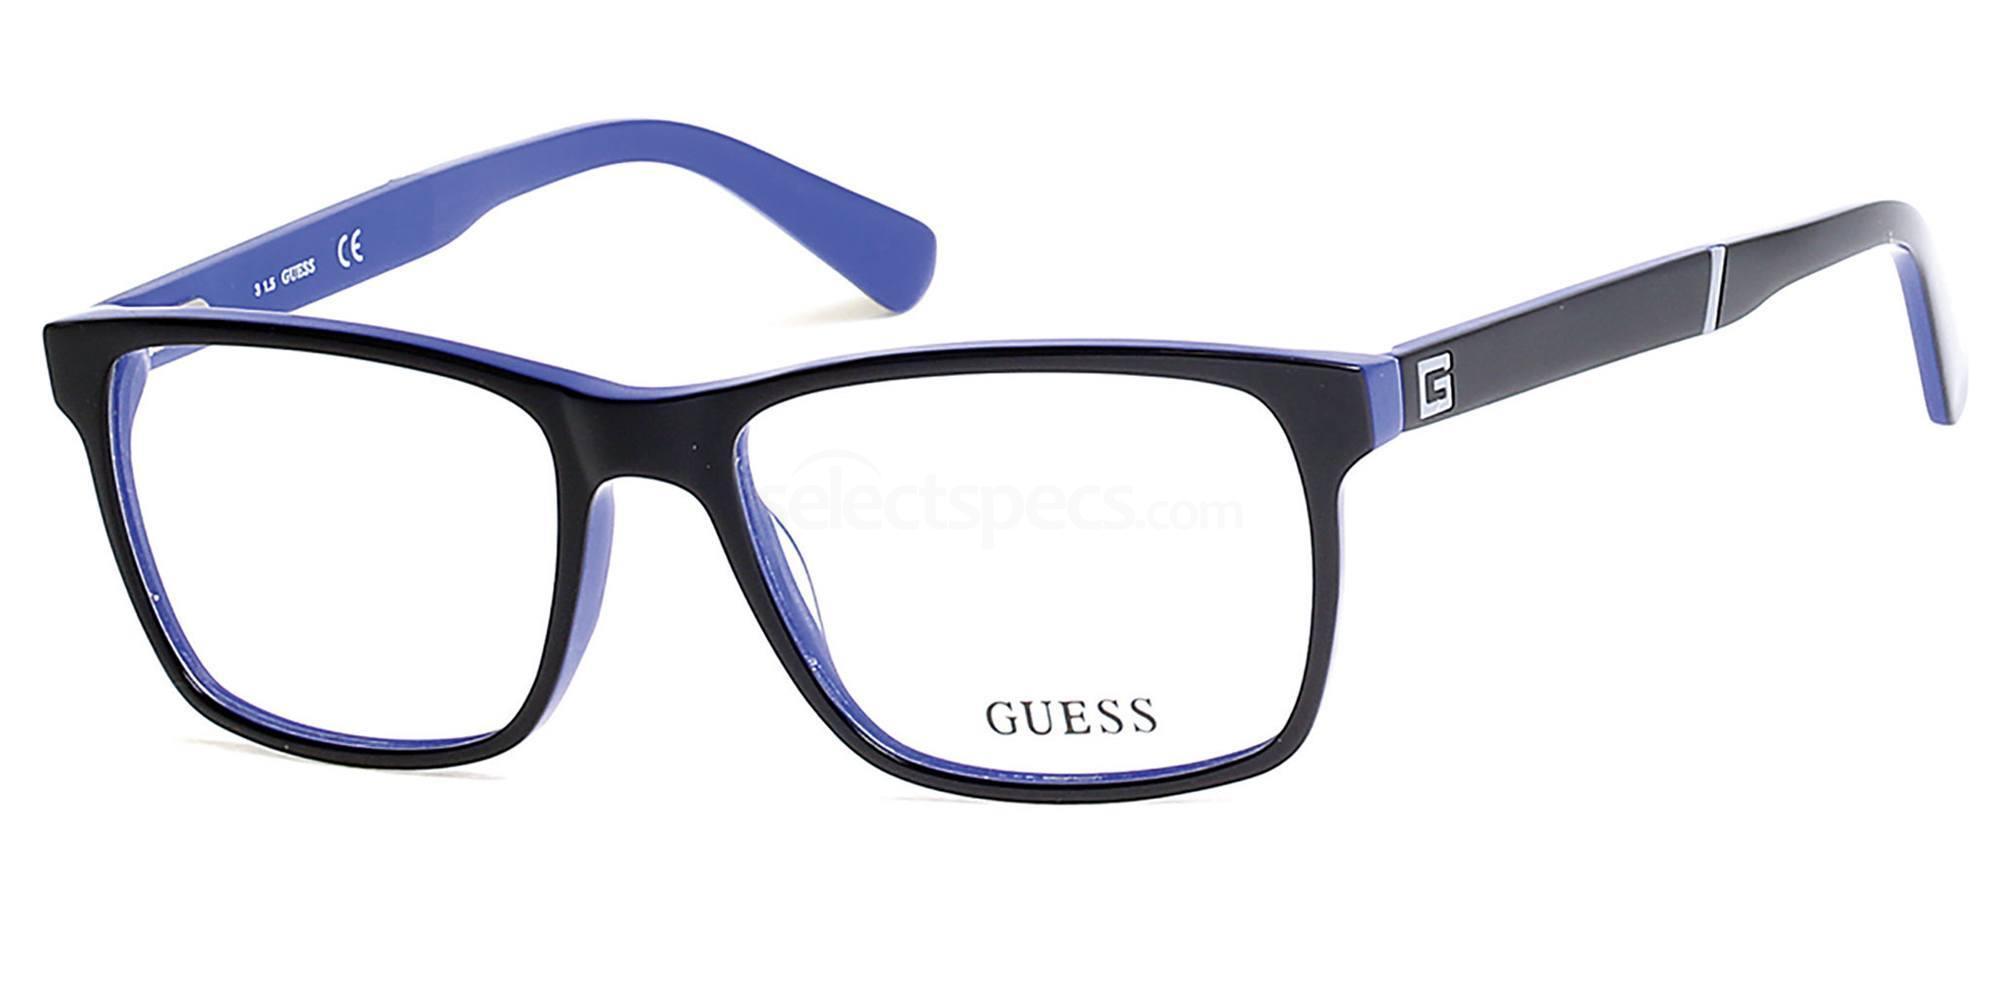 001 GU1901 Glasses, Guess